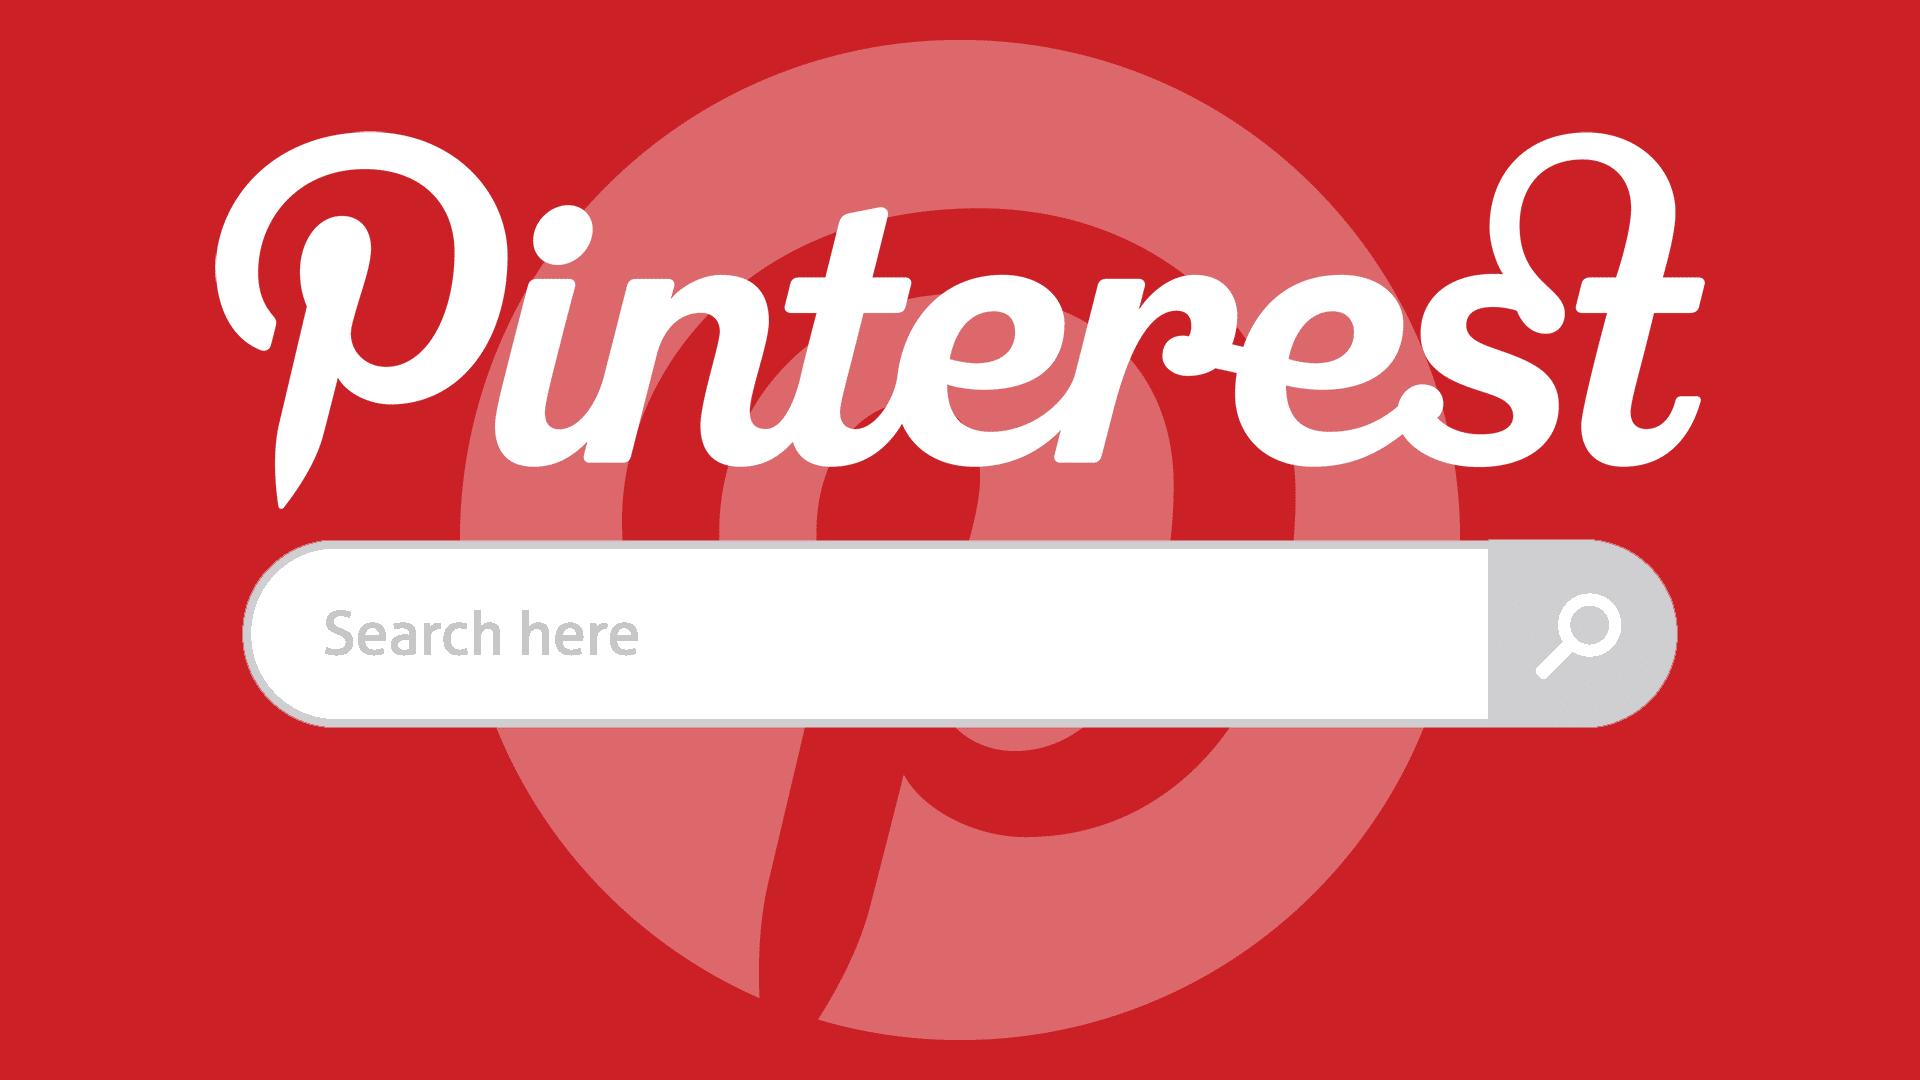 Pinterest : Βάλε το Pin Button και κάνε share με ένα Κλικ στον Firefox !, Προώθηση ιστοσελίδων SEO Marketer